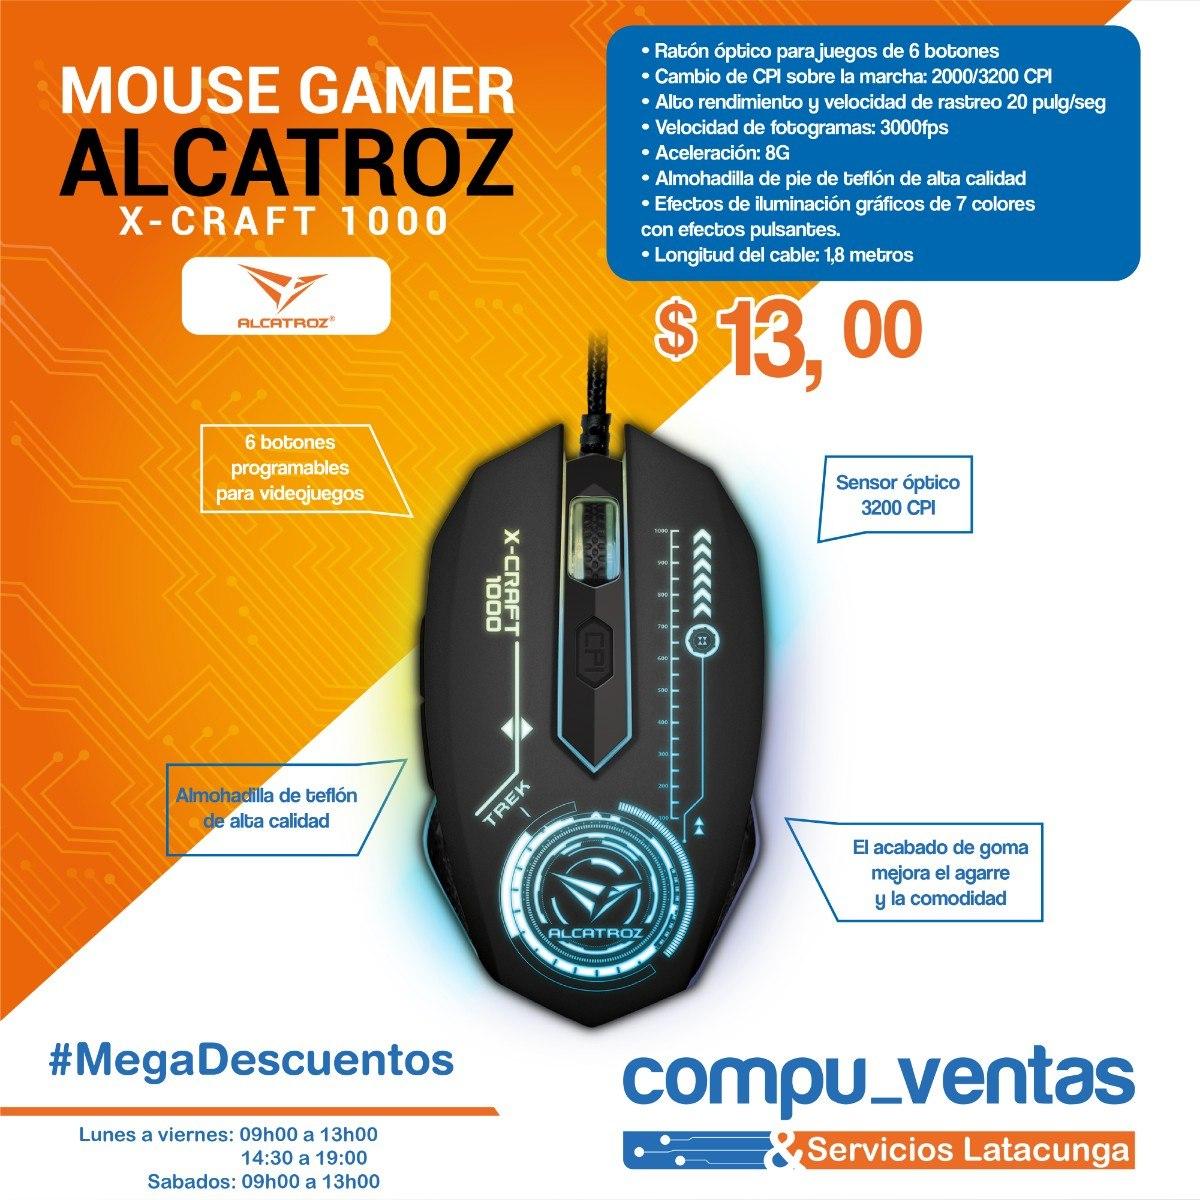 Alcatroz X Craft Trek 1000 Mouse Gaming - Page 3 - Daftar